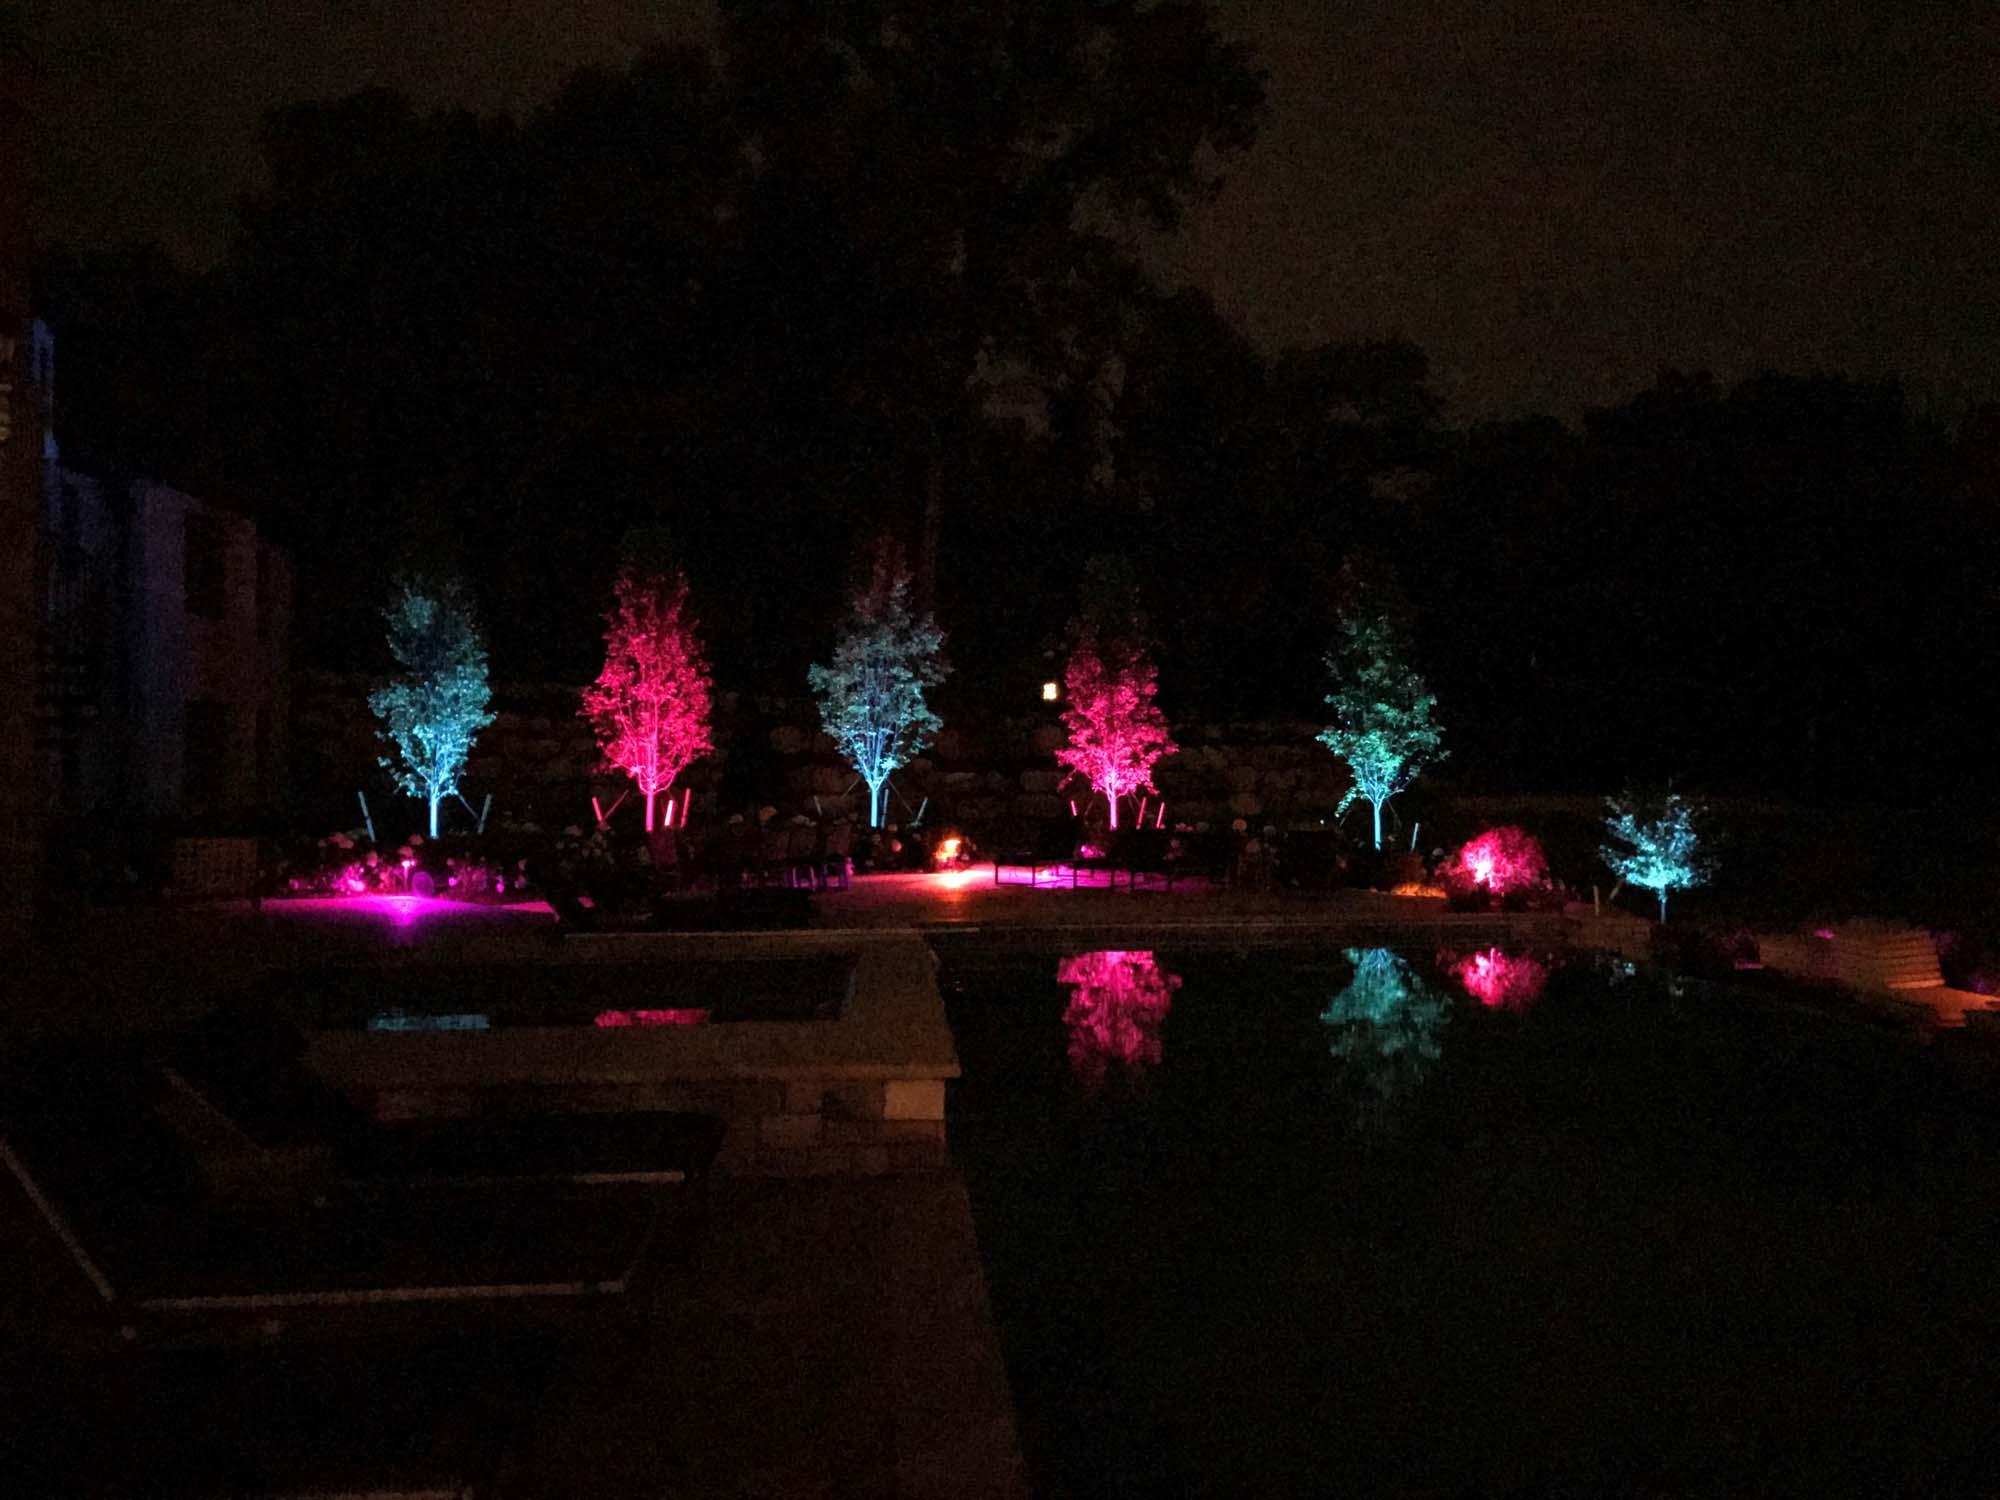 maddox color lighting pic 5